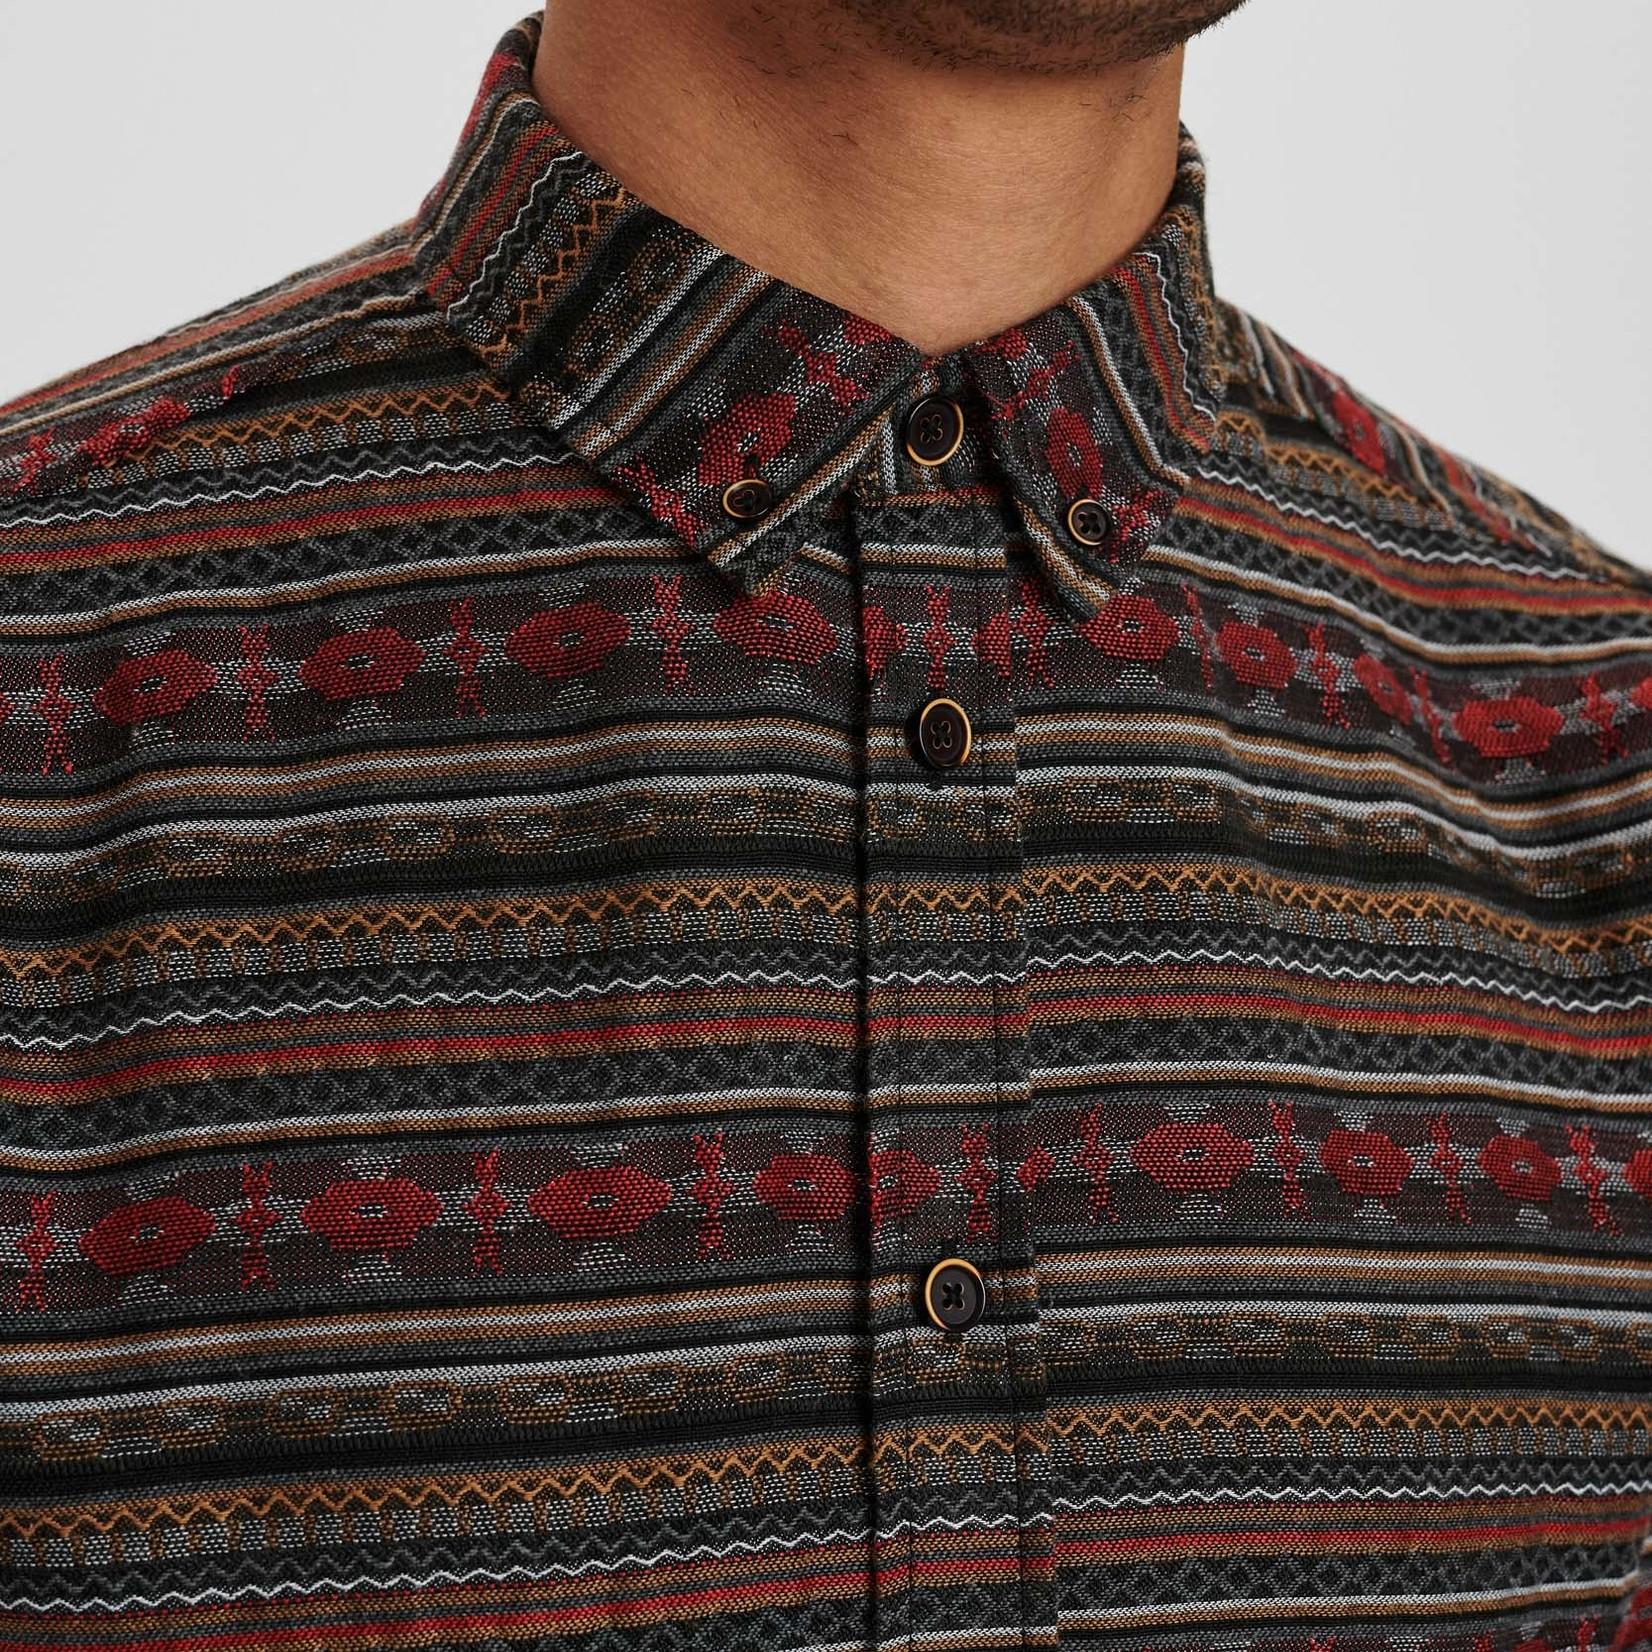 ANERKJENDT AKKONRAD JACQUARD INKA SHIRT, blouse